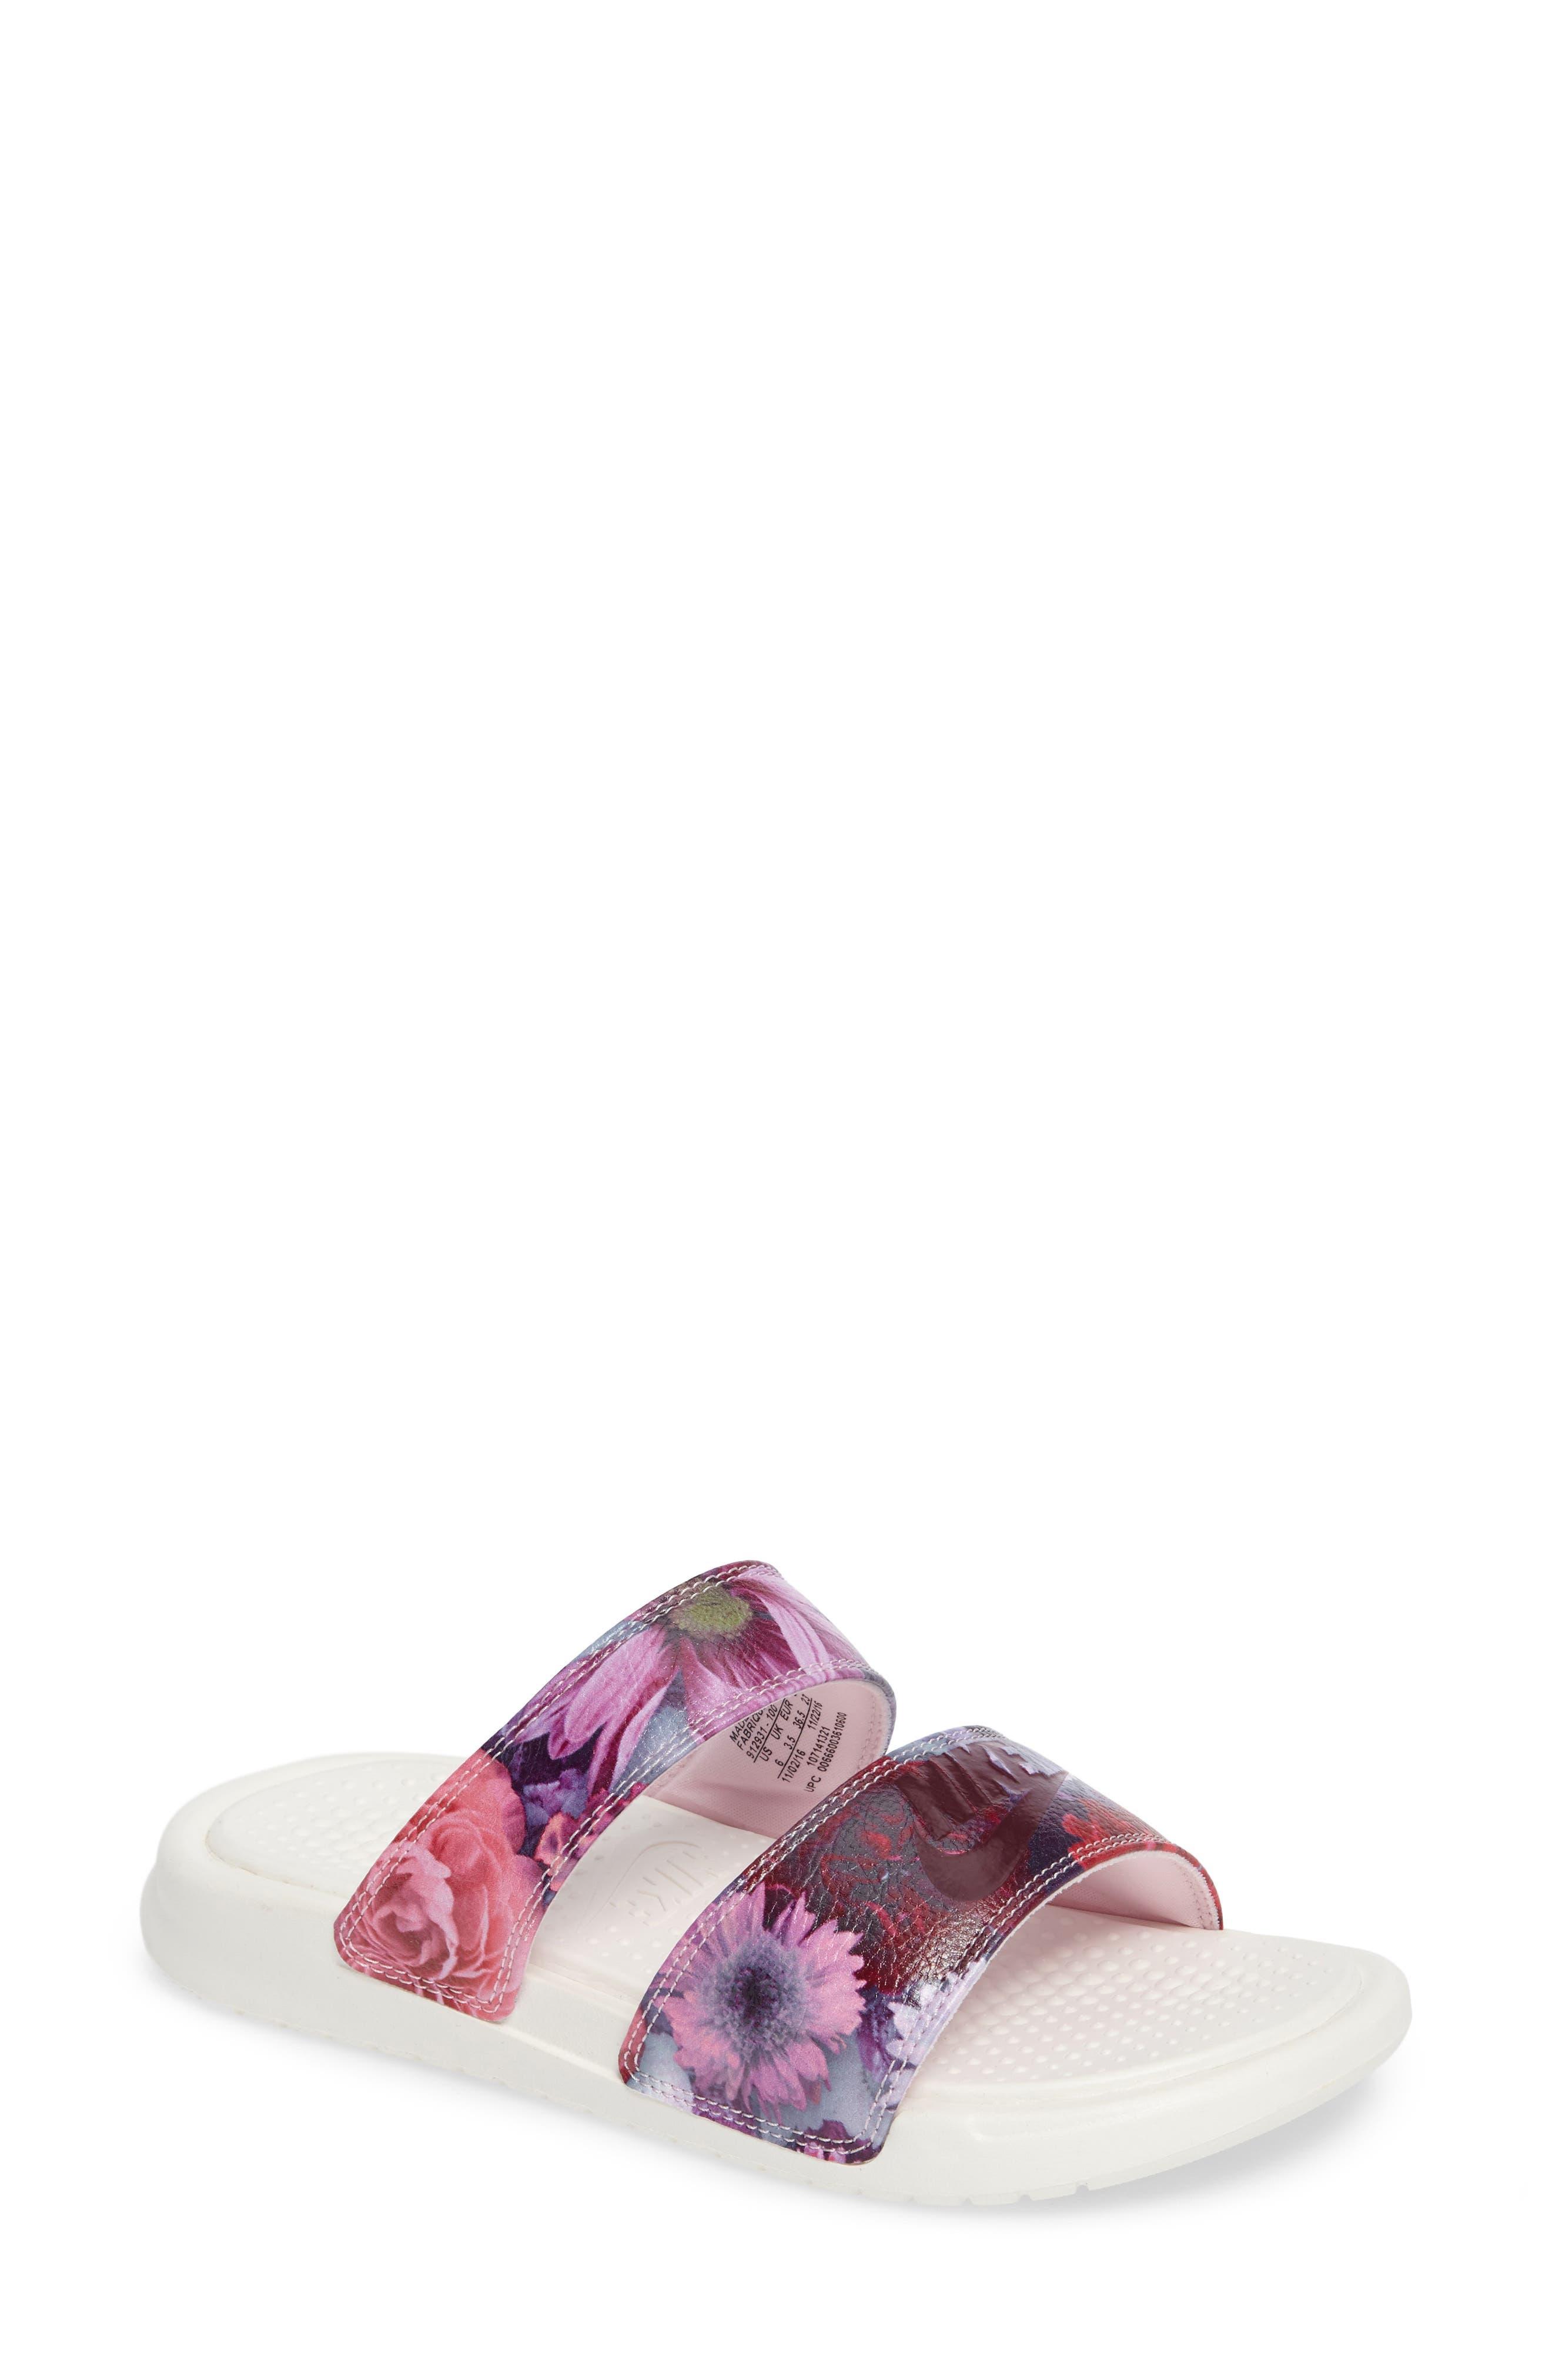 Main Image - Nike Benassi Duo Ultra Slide Sandal (Women)